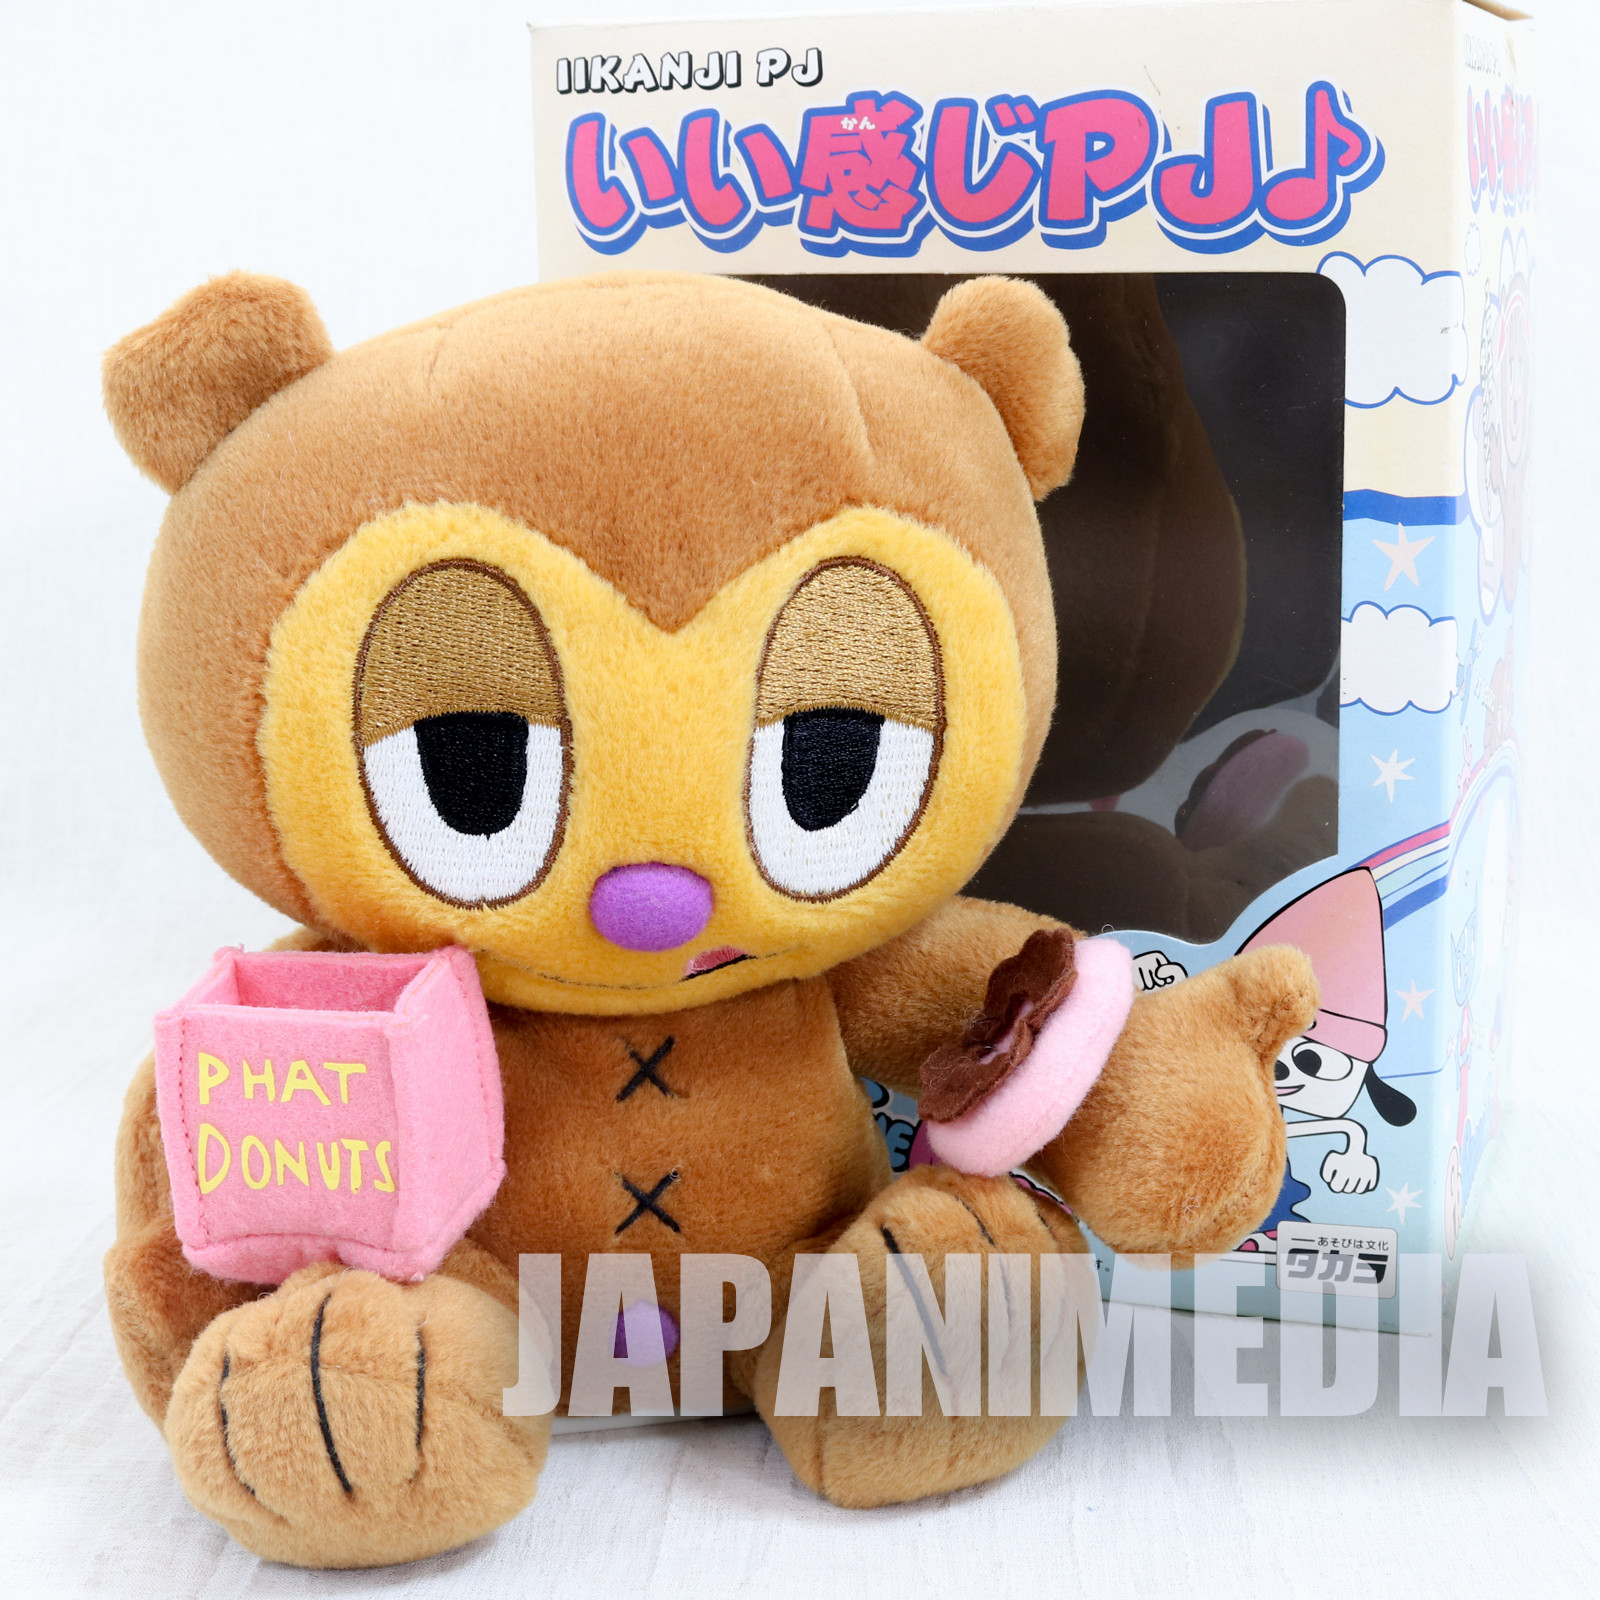 RARE! Parappa The Rapper Iikanji PJ BERRY Sound Action Plush Doll TAKARA JAPAN